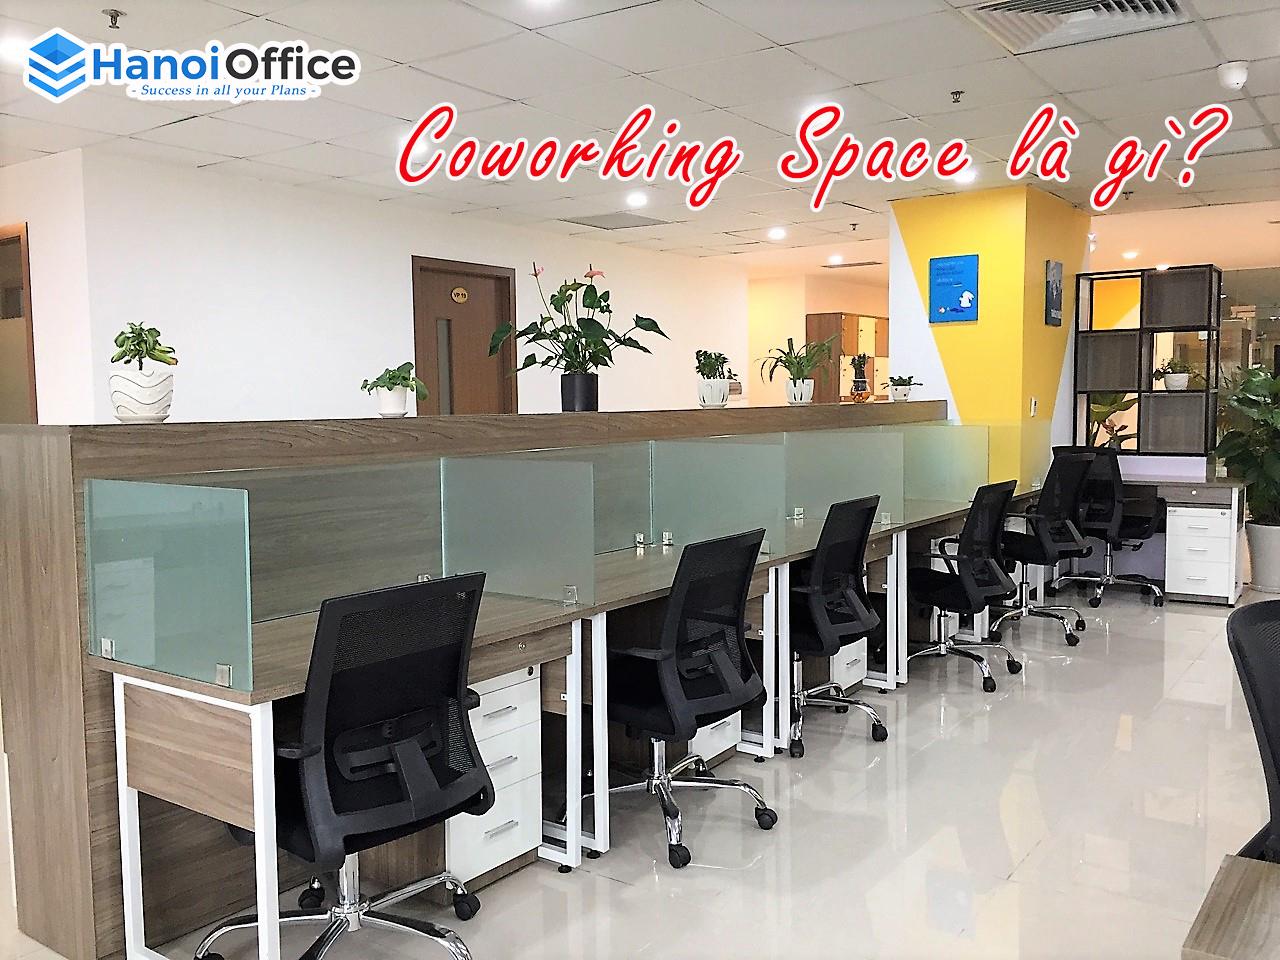 coworking-space-tai-ha-dong-gia-re-1